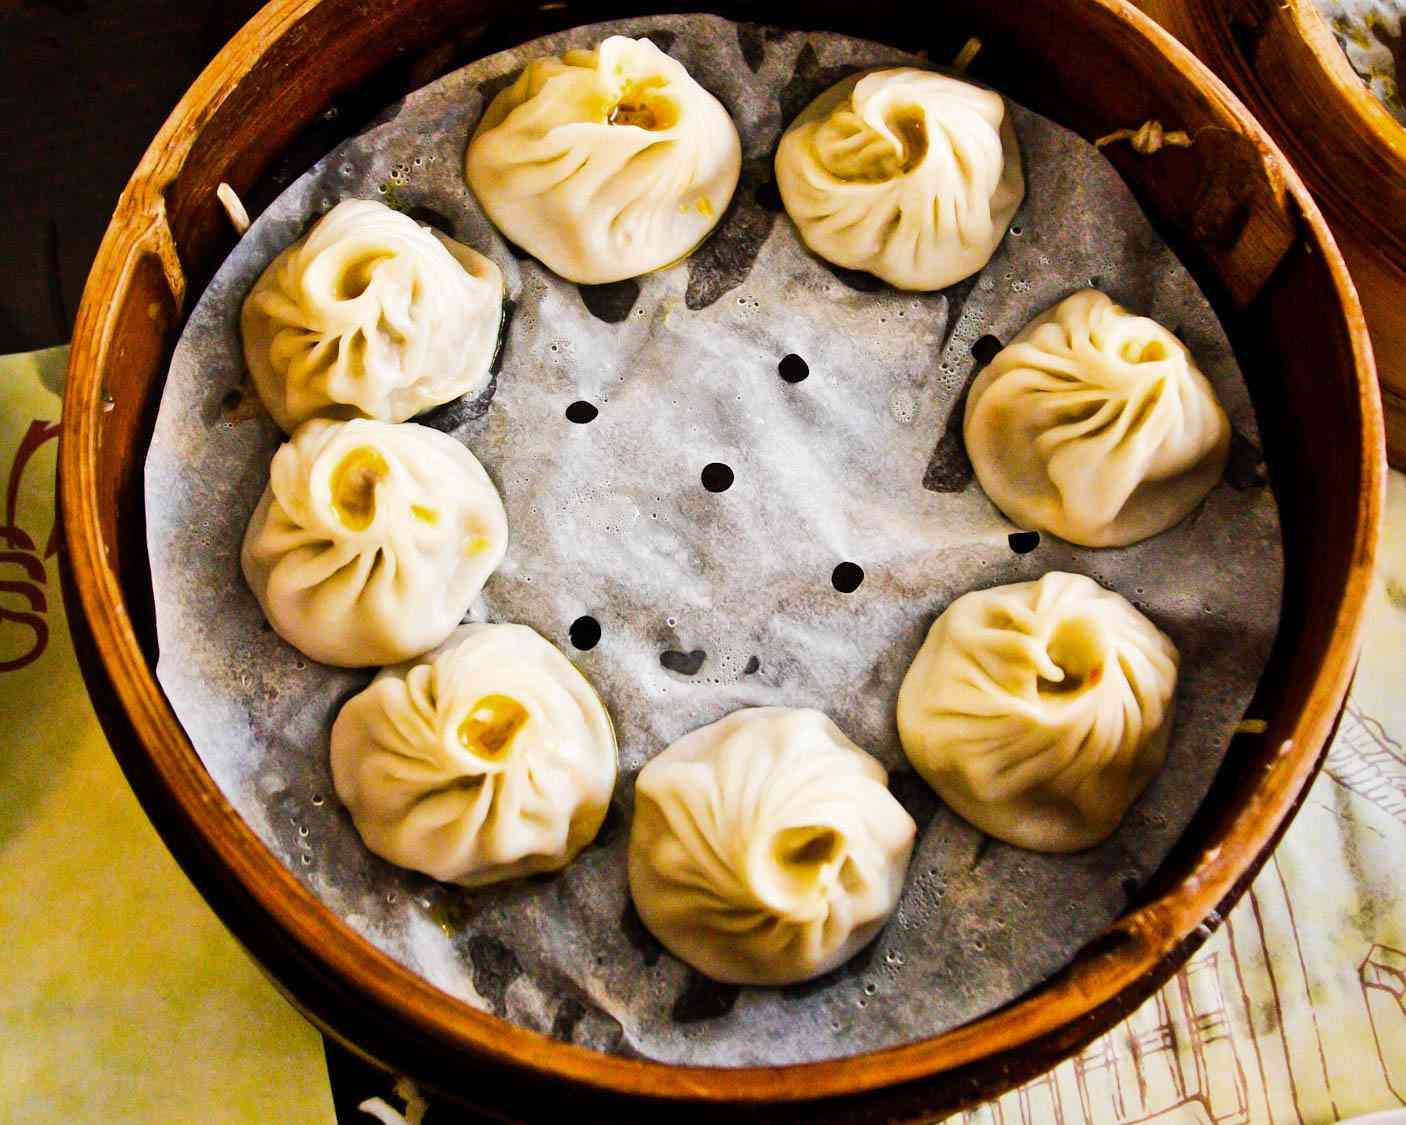 20150523-shanghai-streetfood-xiaolongbao-fionareilly-slide-01.jpg